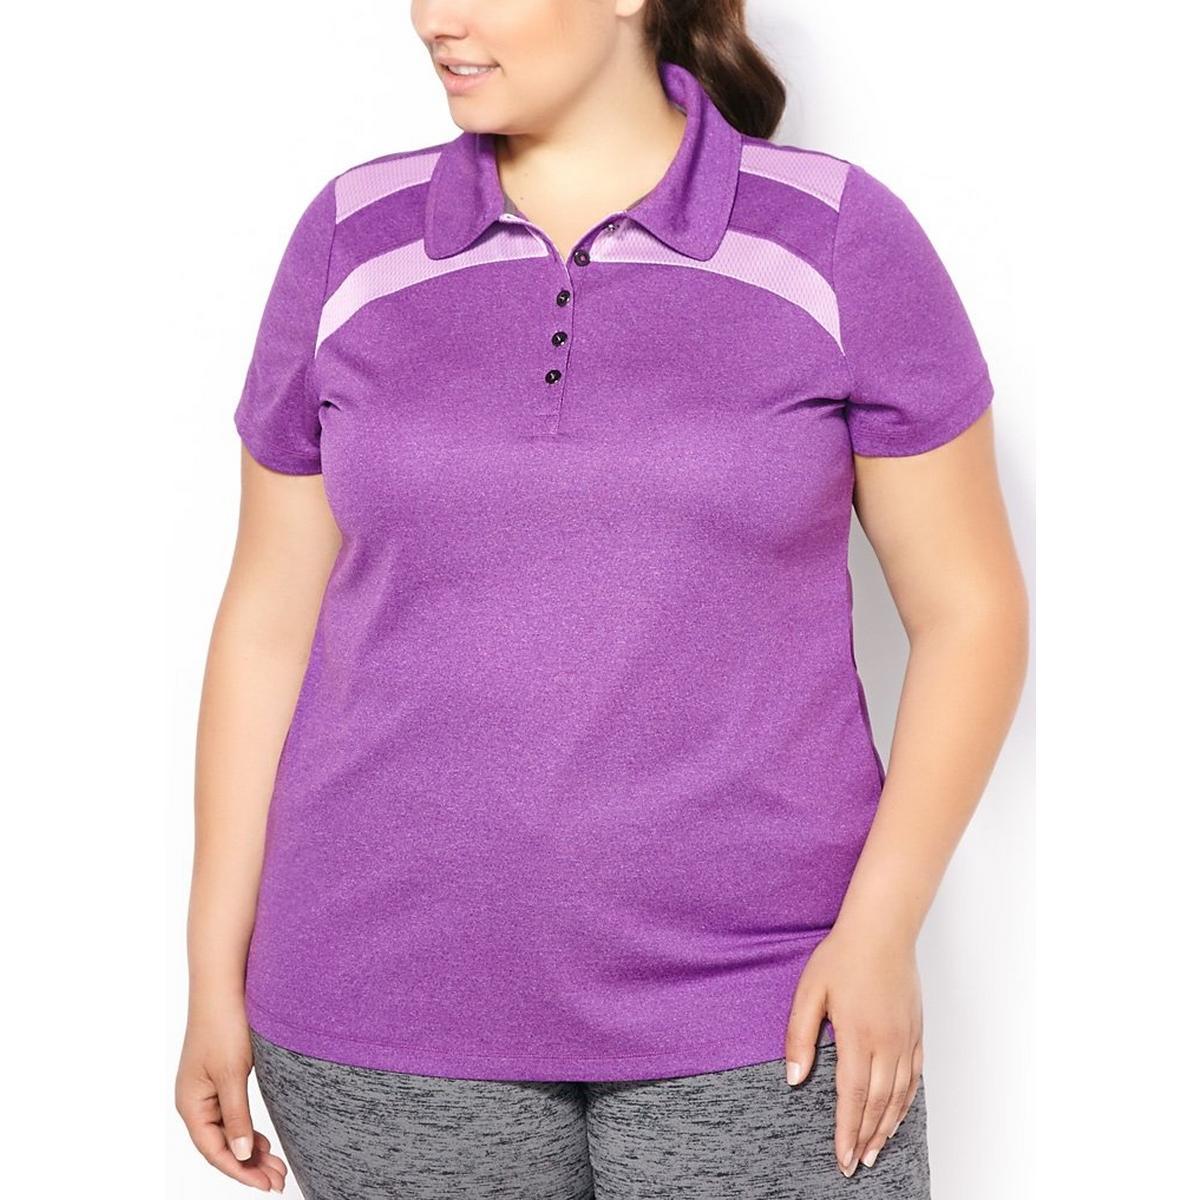 15888b00a98 Ladies Polo Shirts Plus Size - BCD Tofu House